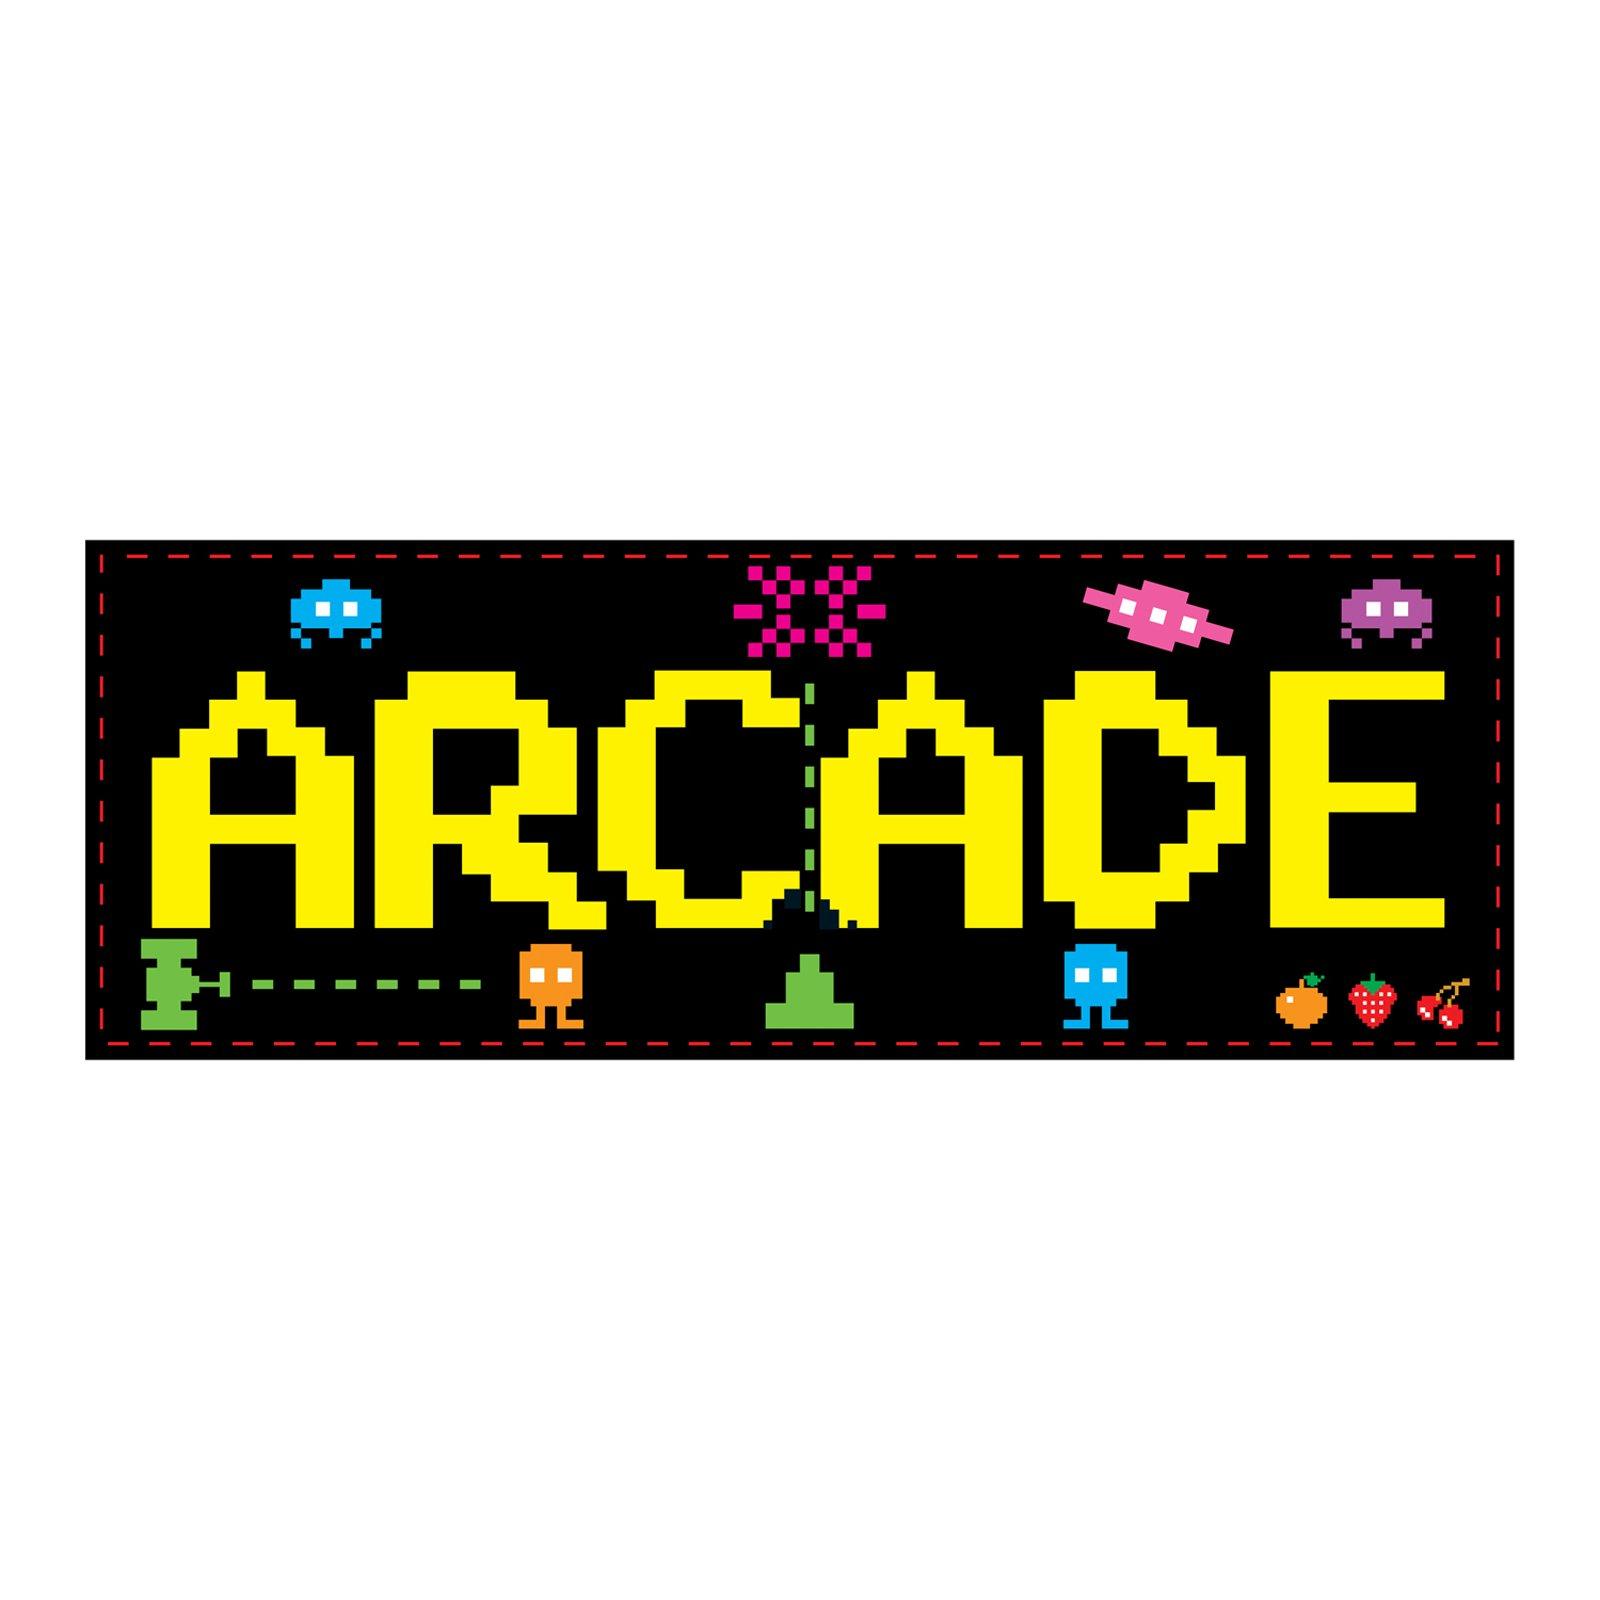 Retro 80s Baby Shower Video Game Theme